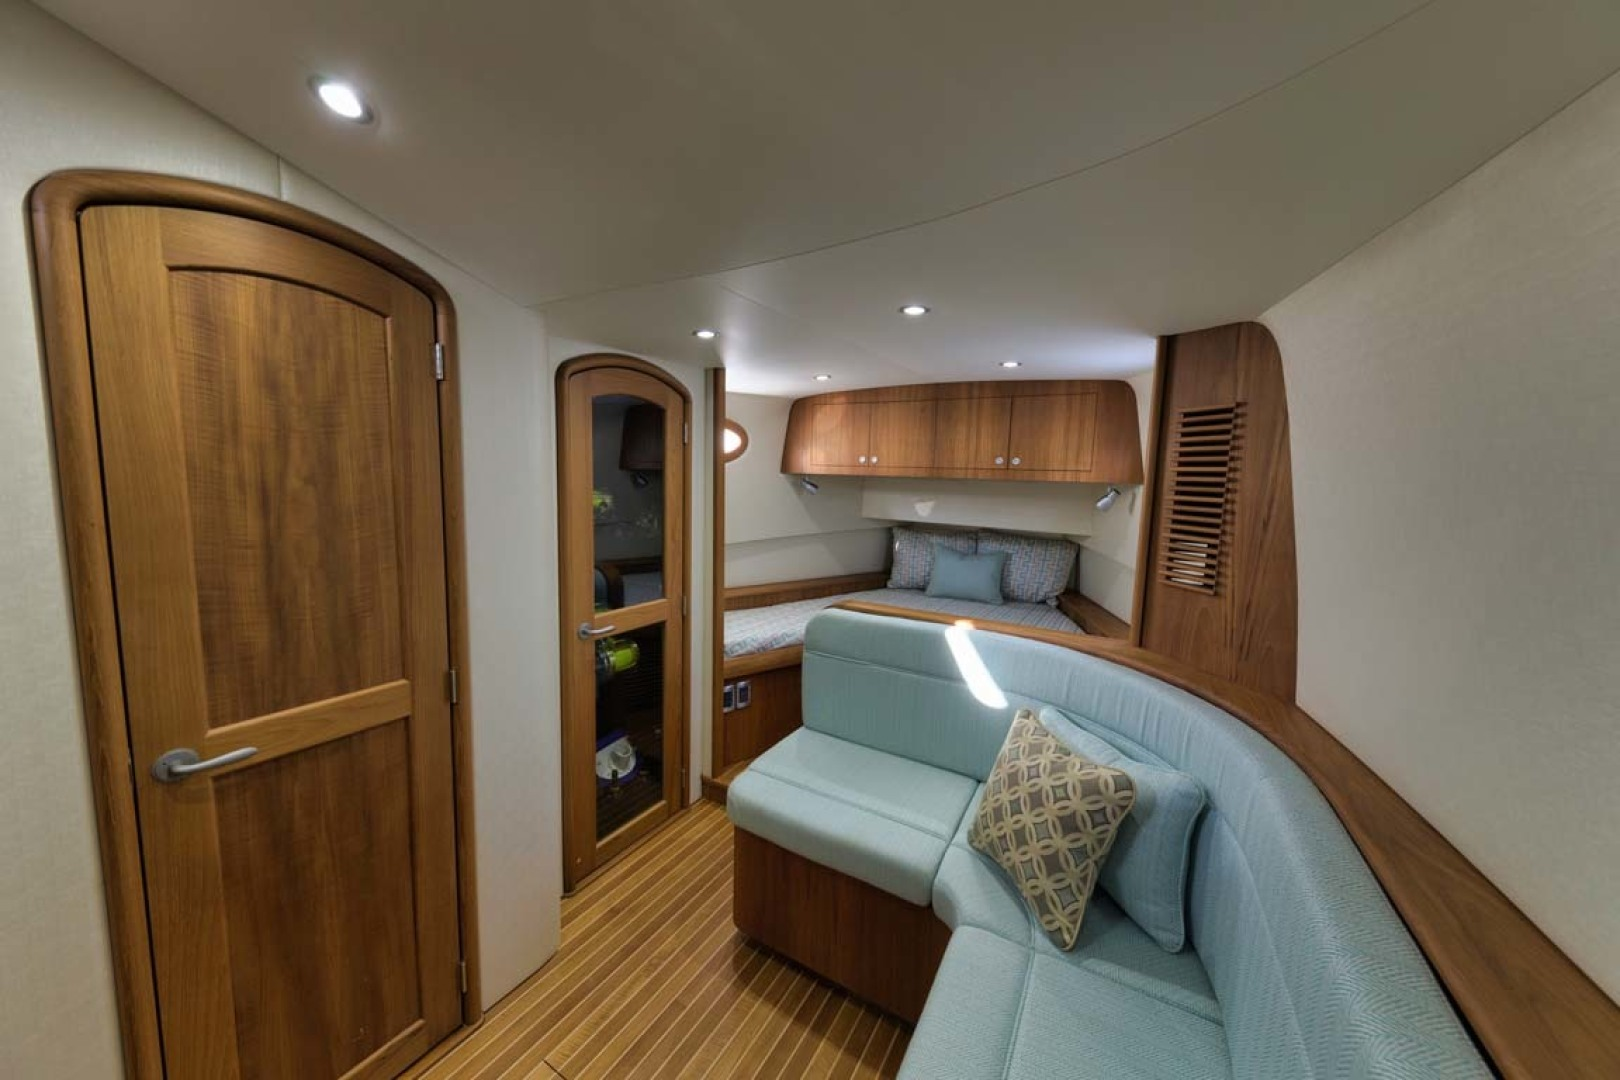 Winter Custom Yachts-46 Walkaround 2019-Family Circus Stuart-Florida-United States-Teak Accents-1563740 | Thumbnail